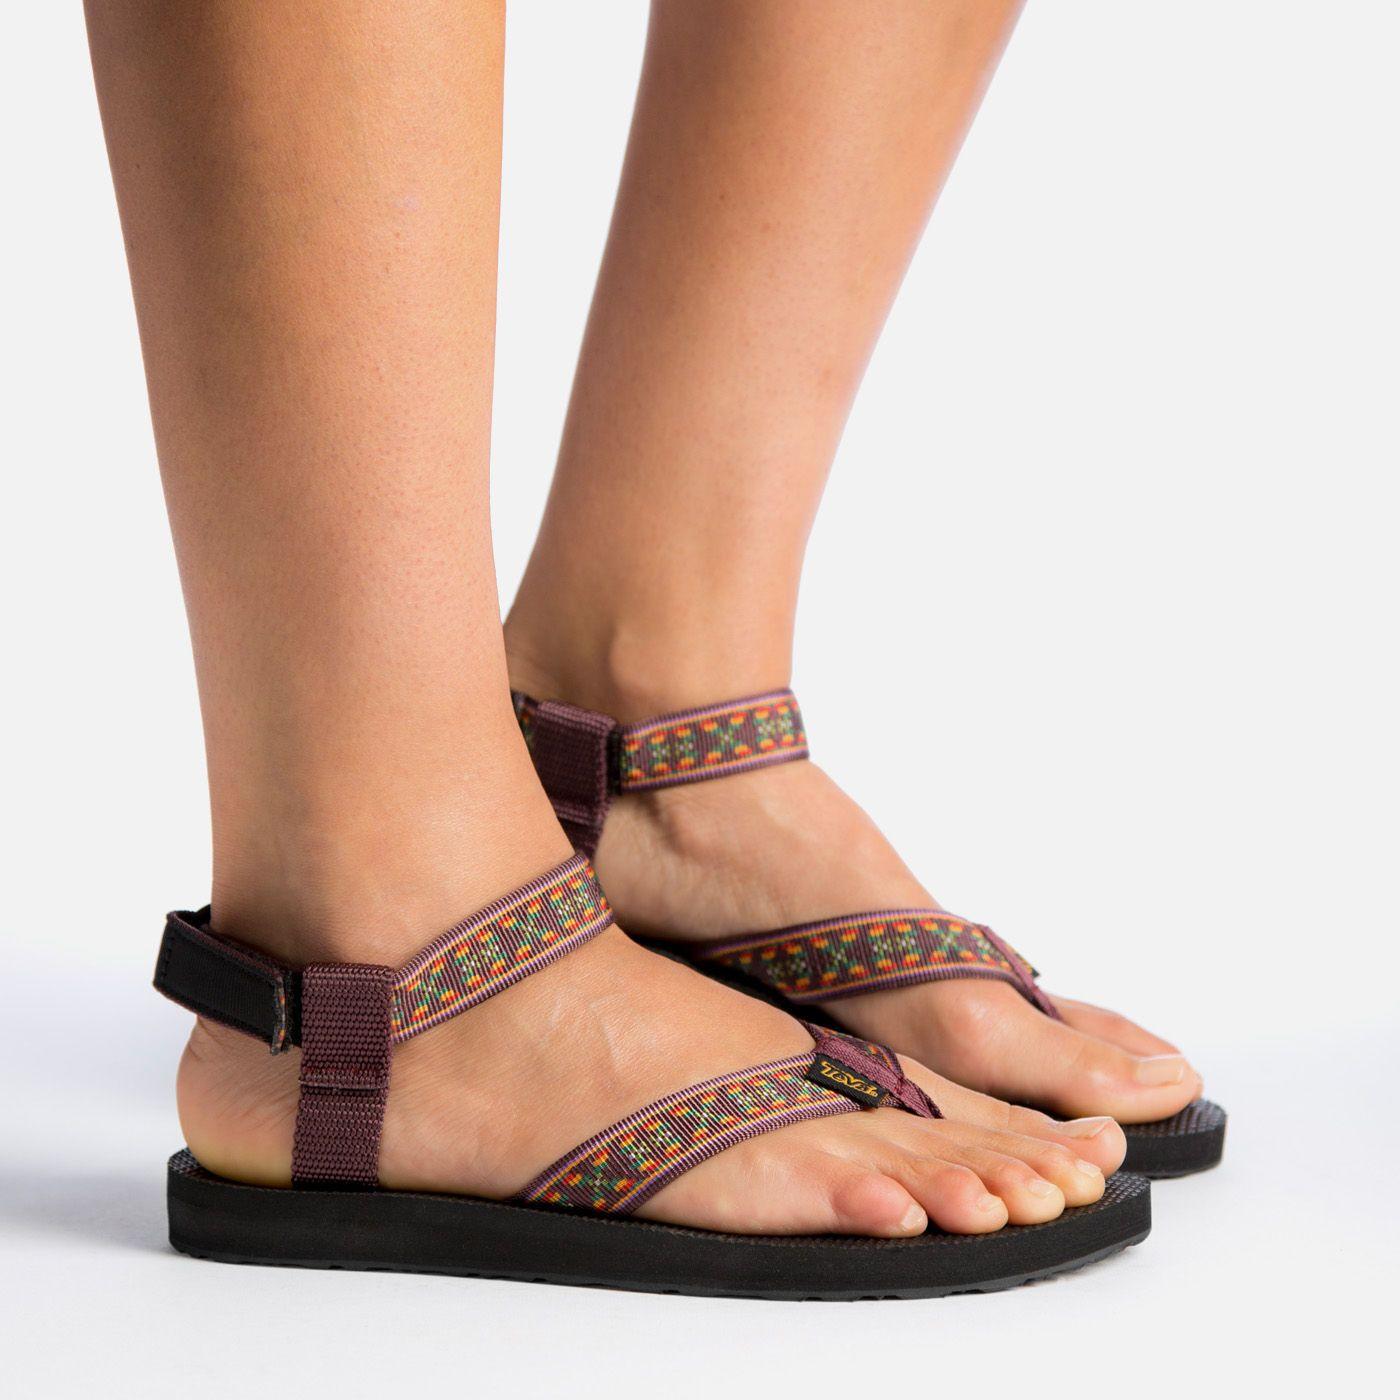 Teva 174 Original Sandal For Women Free Shipping At Teva